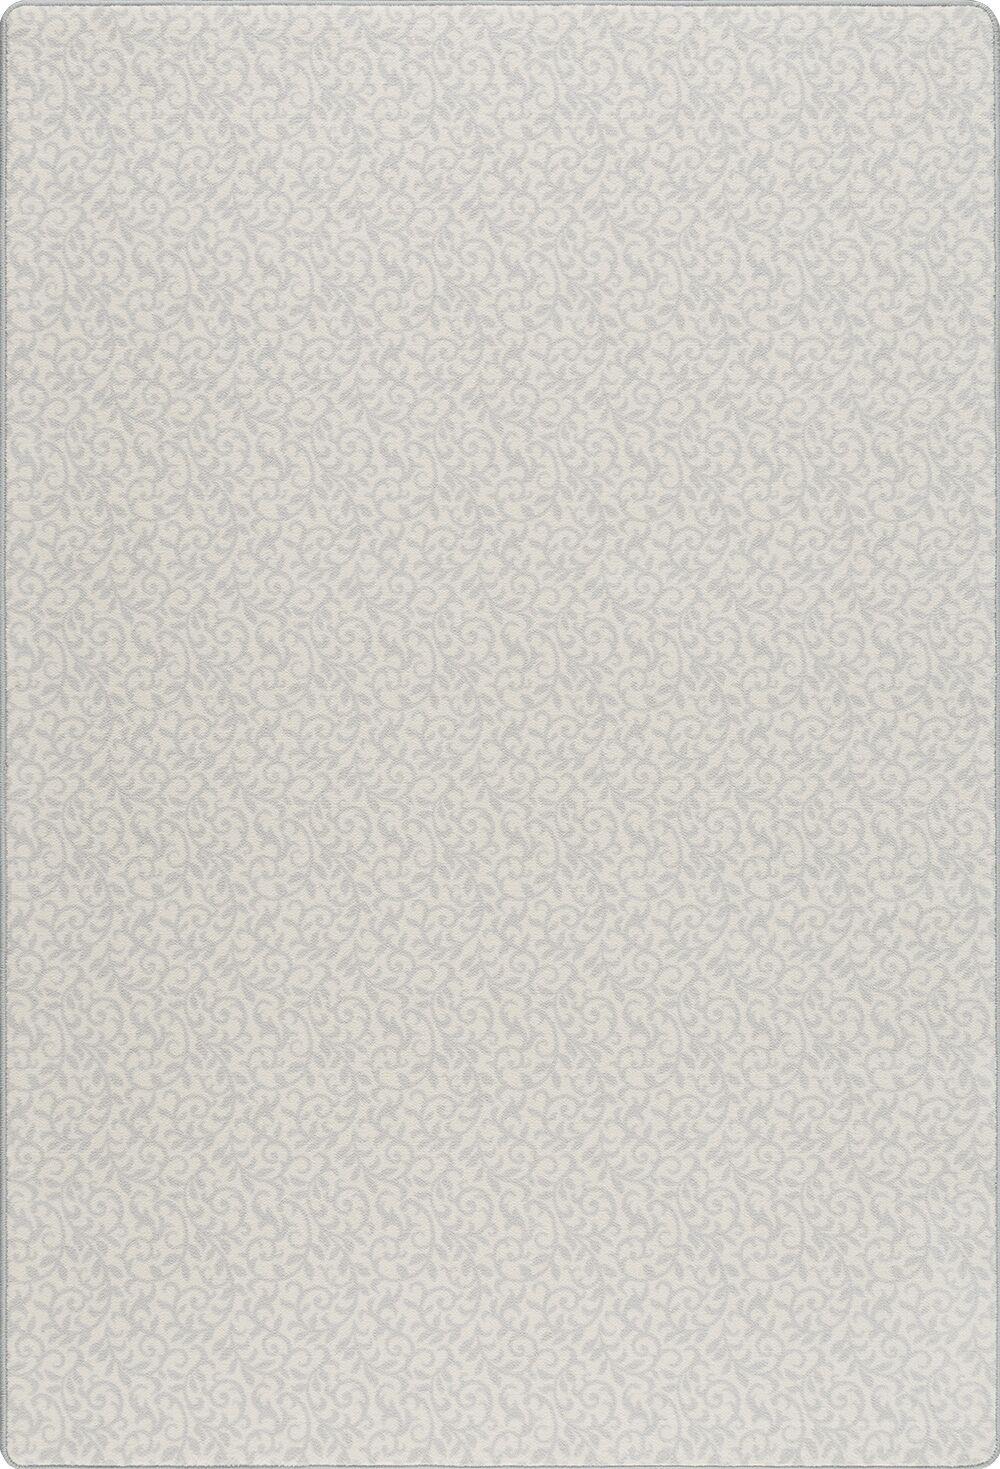 Hawkinge Sky Pearl Area Rug Rug Size: Rectangle 7'8